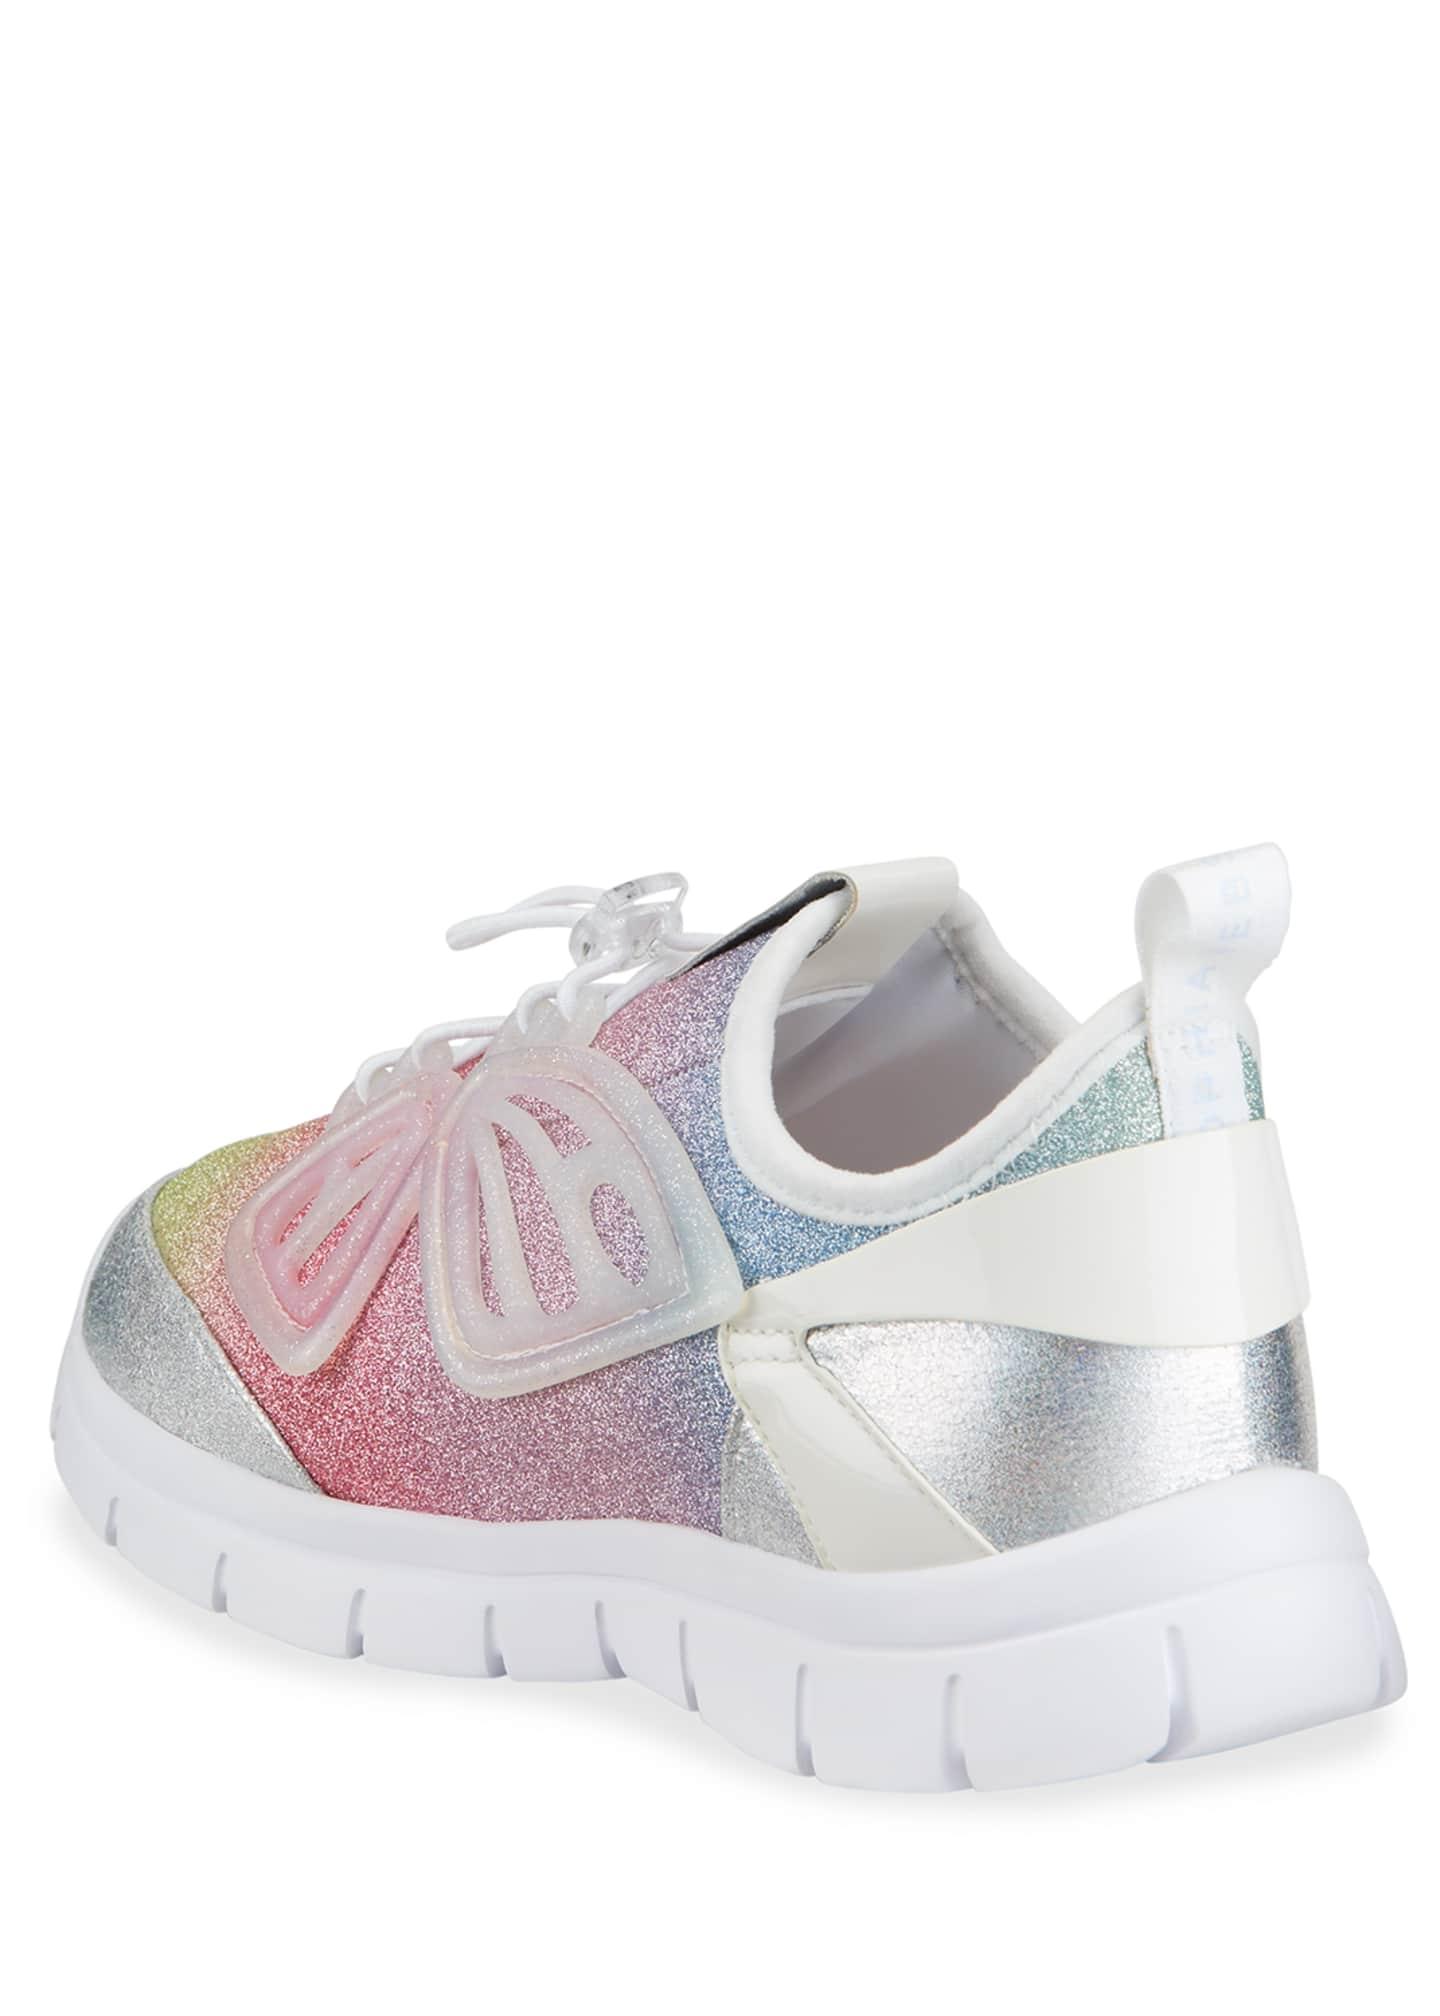 Sophia Webster Girl's Fly By Ombre Pastel Glitter Sneakers ...